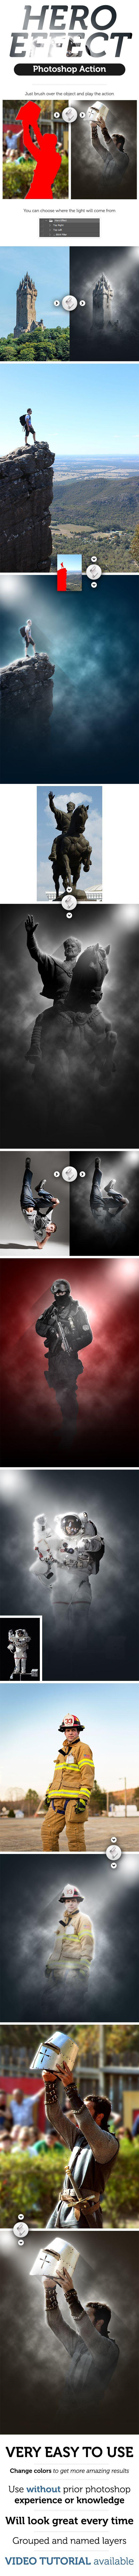 Hero Effect Photoshop Action. Download here: http://graphicriver.net/item/hero-effect-photoshop-action/16515807?ref=ksioks